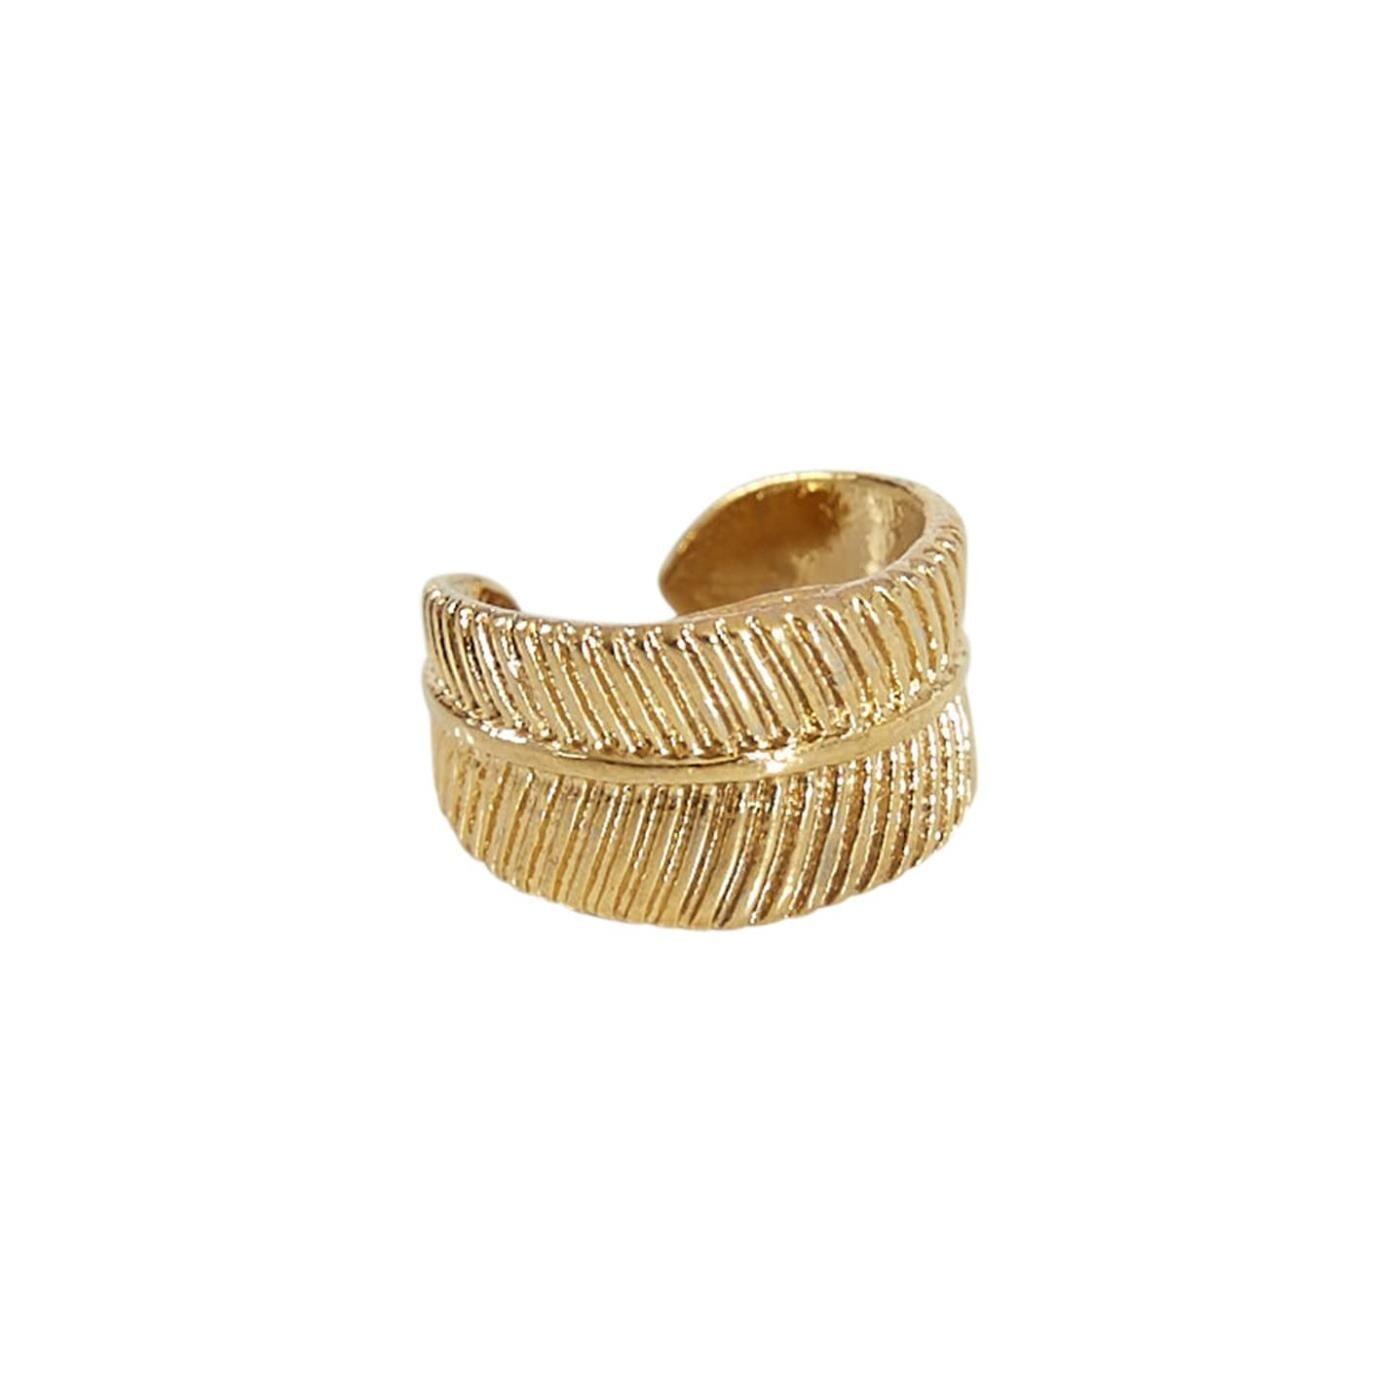 Celestino Ανάγλυφο σκουλαρίκι χωρίς κούμπωμα  - Χρυσαφι - Grootte: One Size